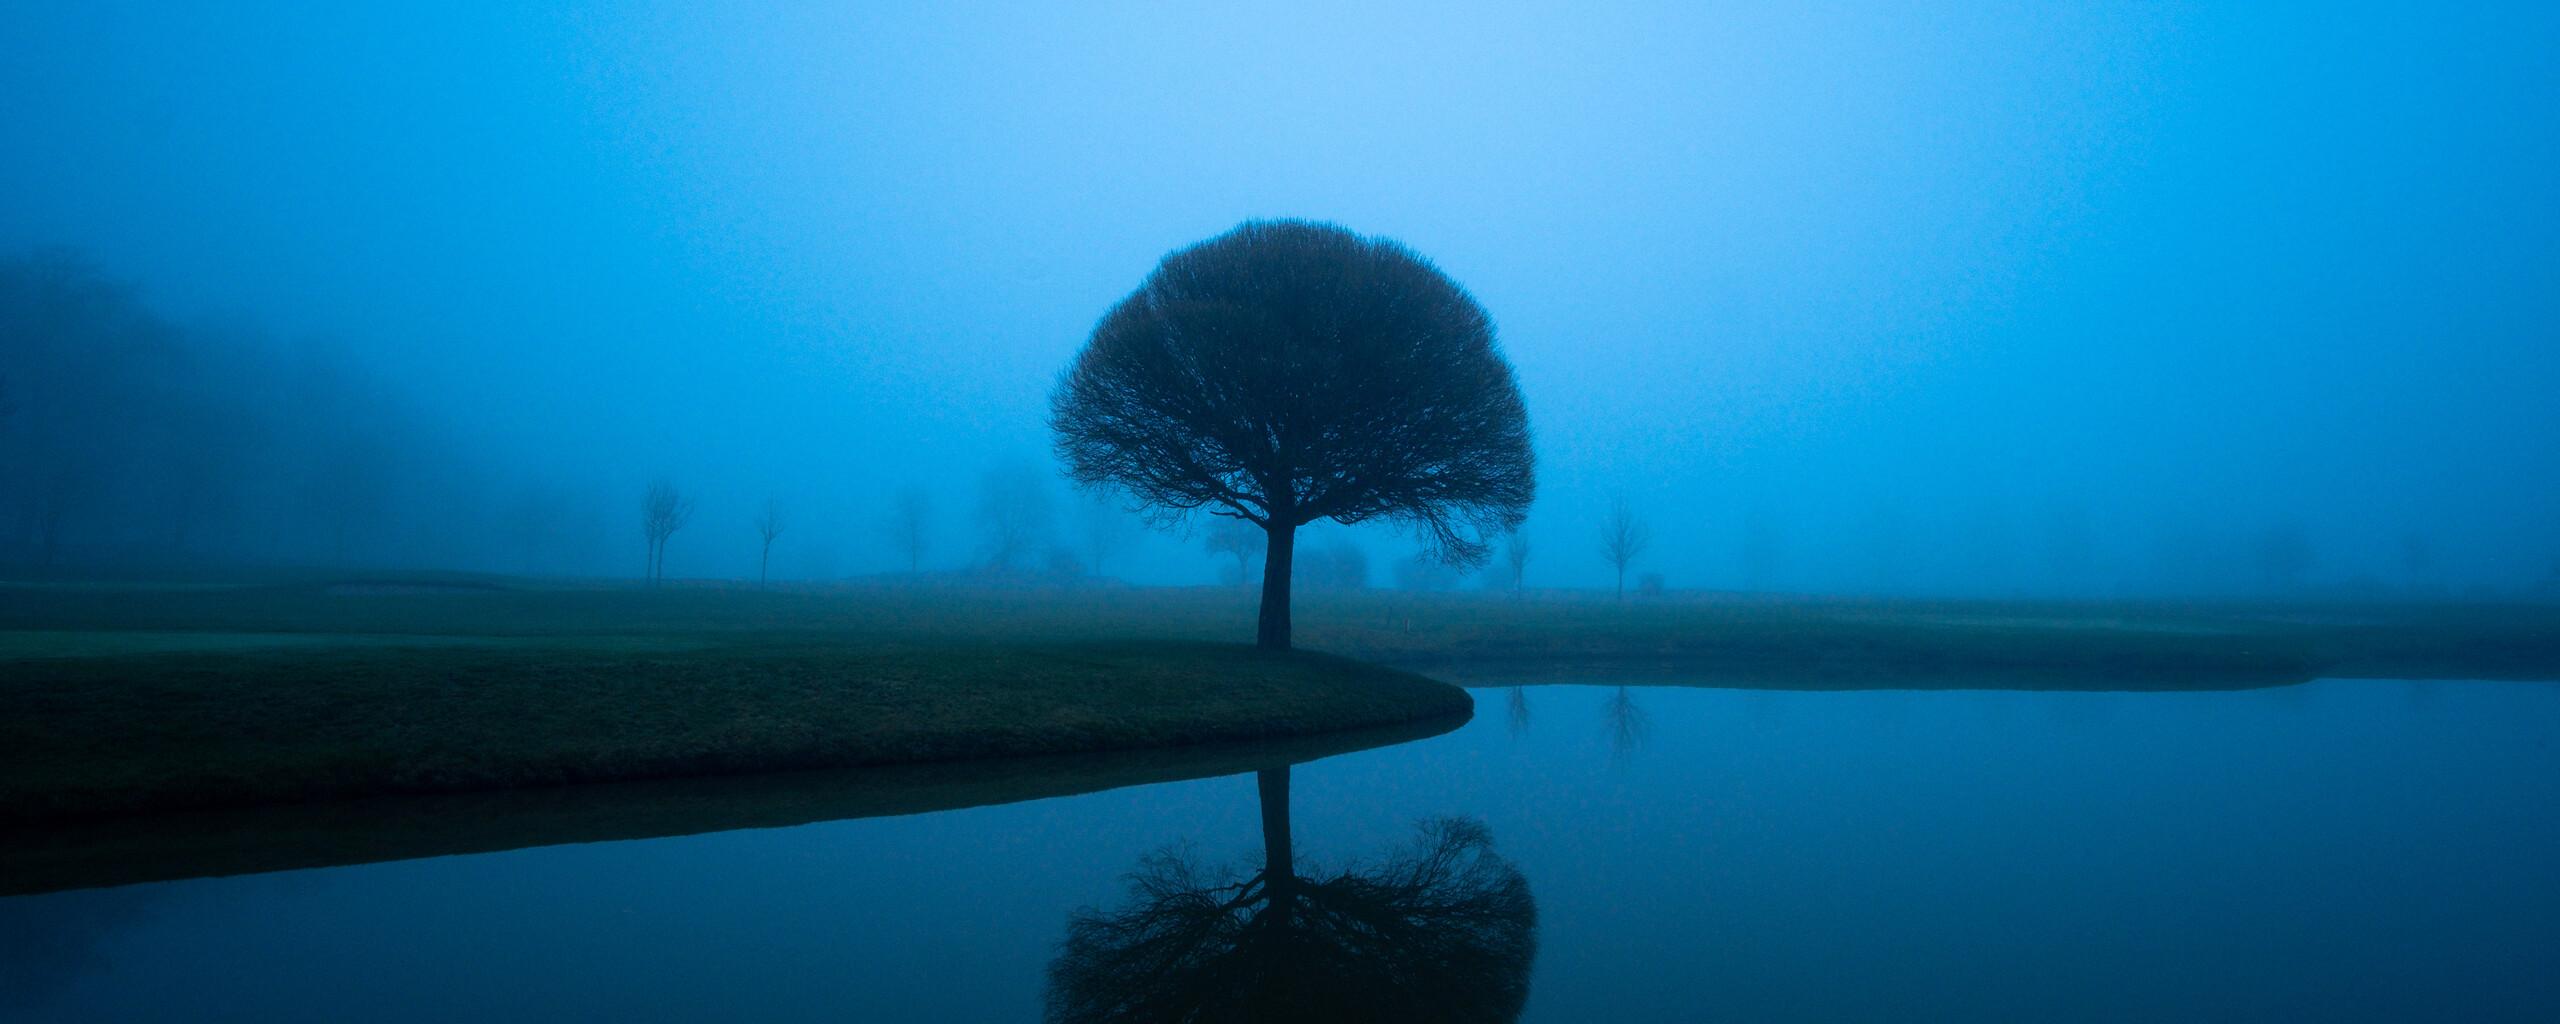 tree-mistscape-5k-ht.jpg